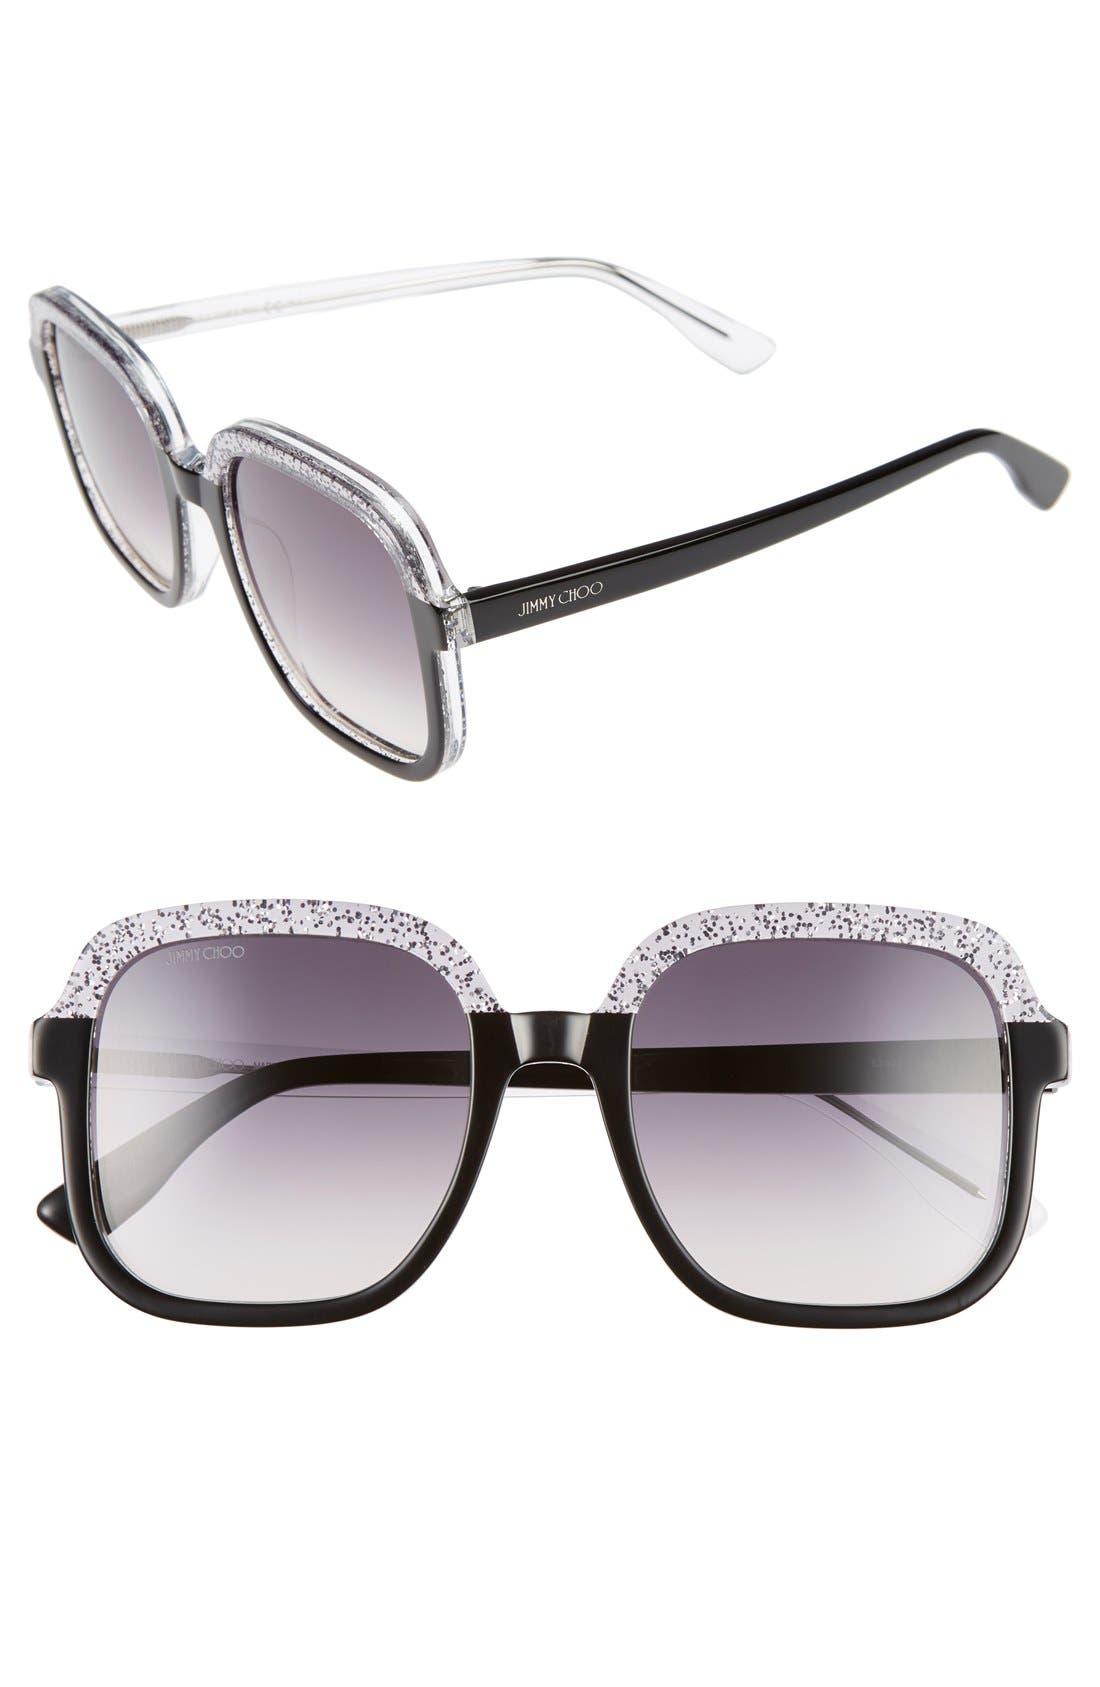 53mm Glitter Frame Sunglasses,                         Main,                         color, 001